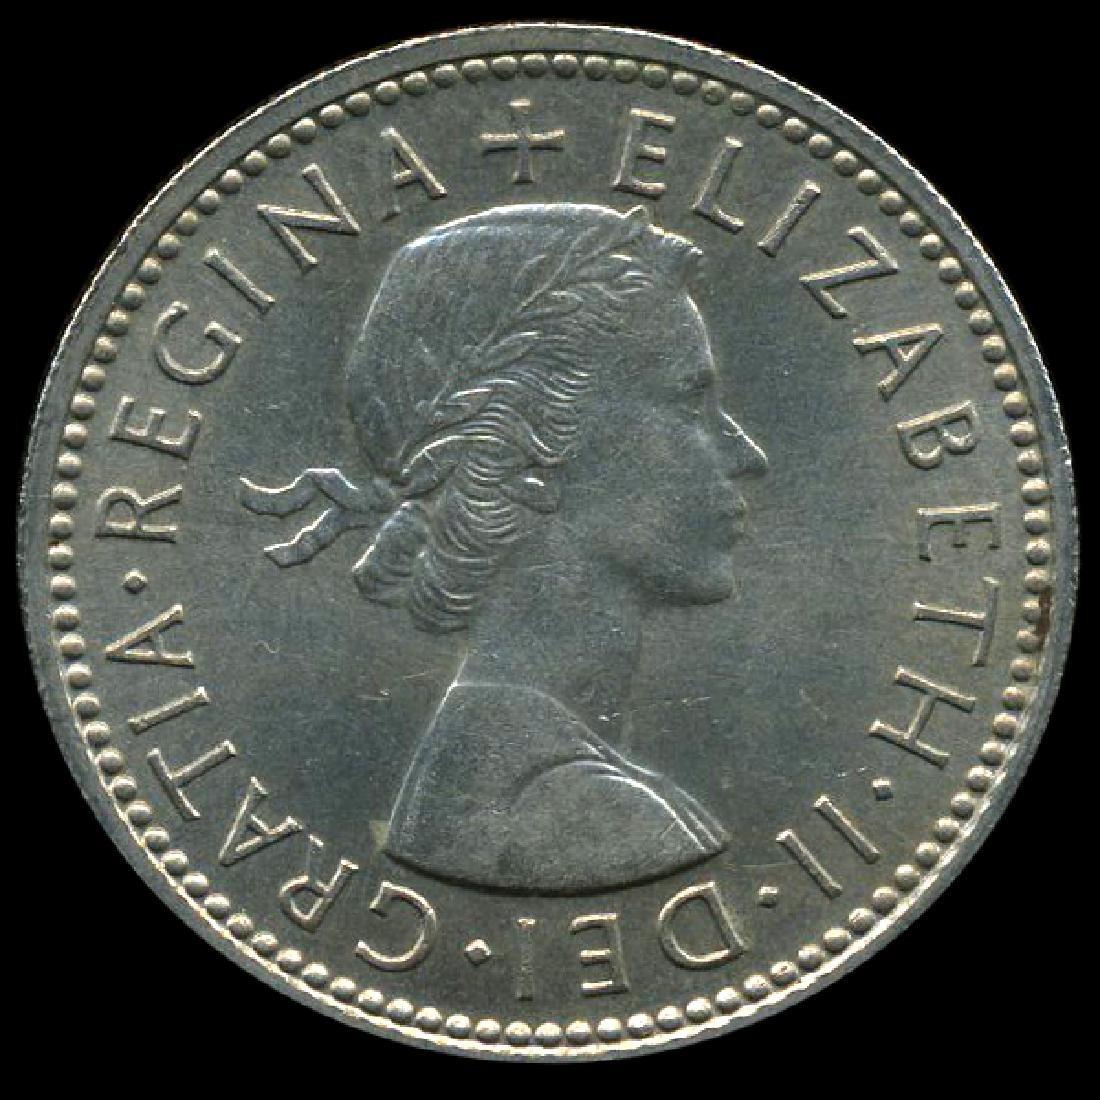 1959 British QE2 1 Shilling Scarce Scottish Rev CHOICE